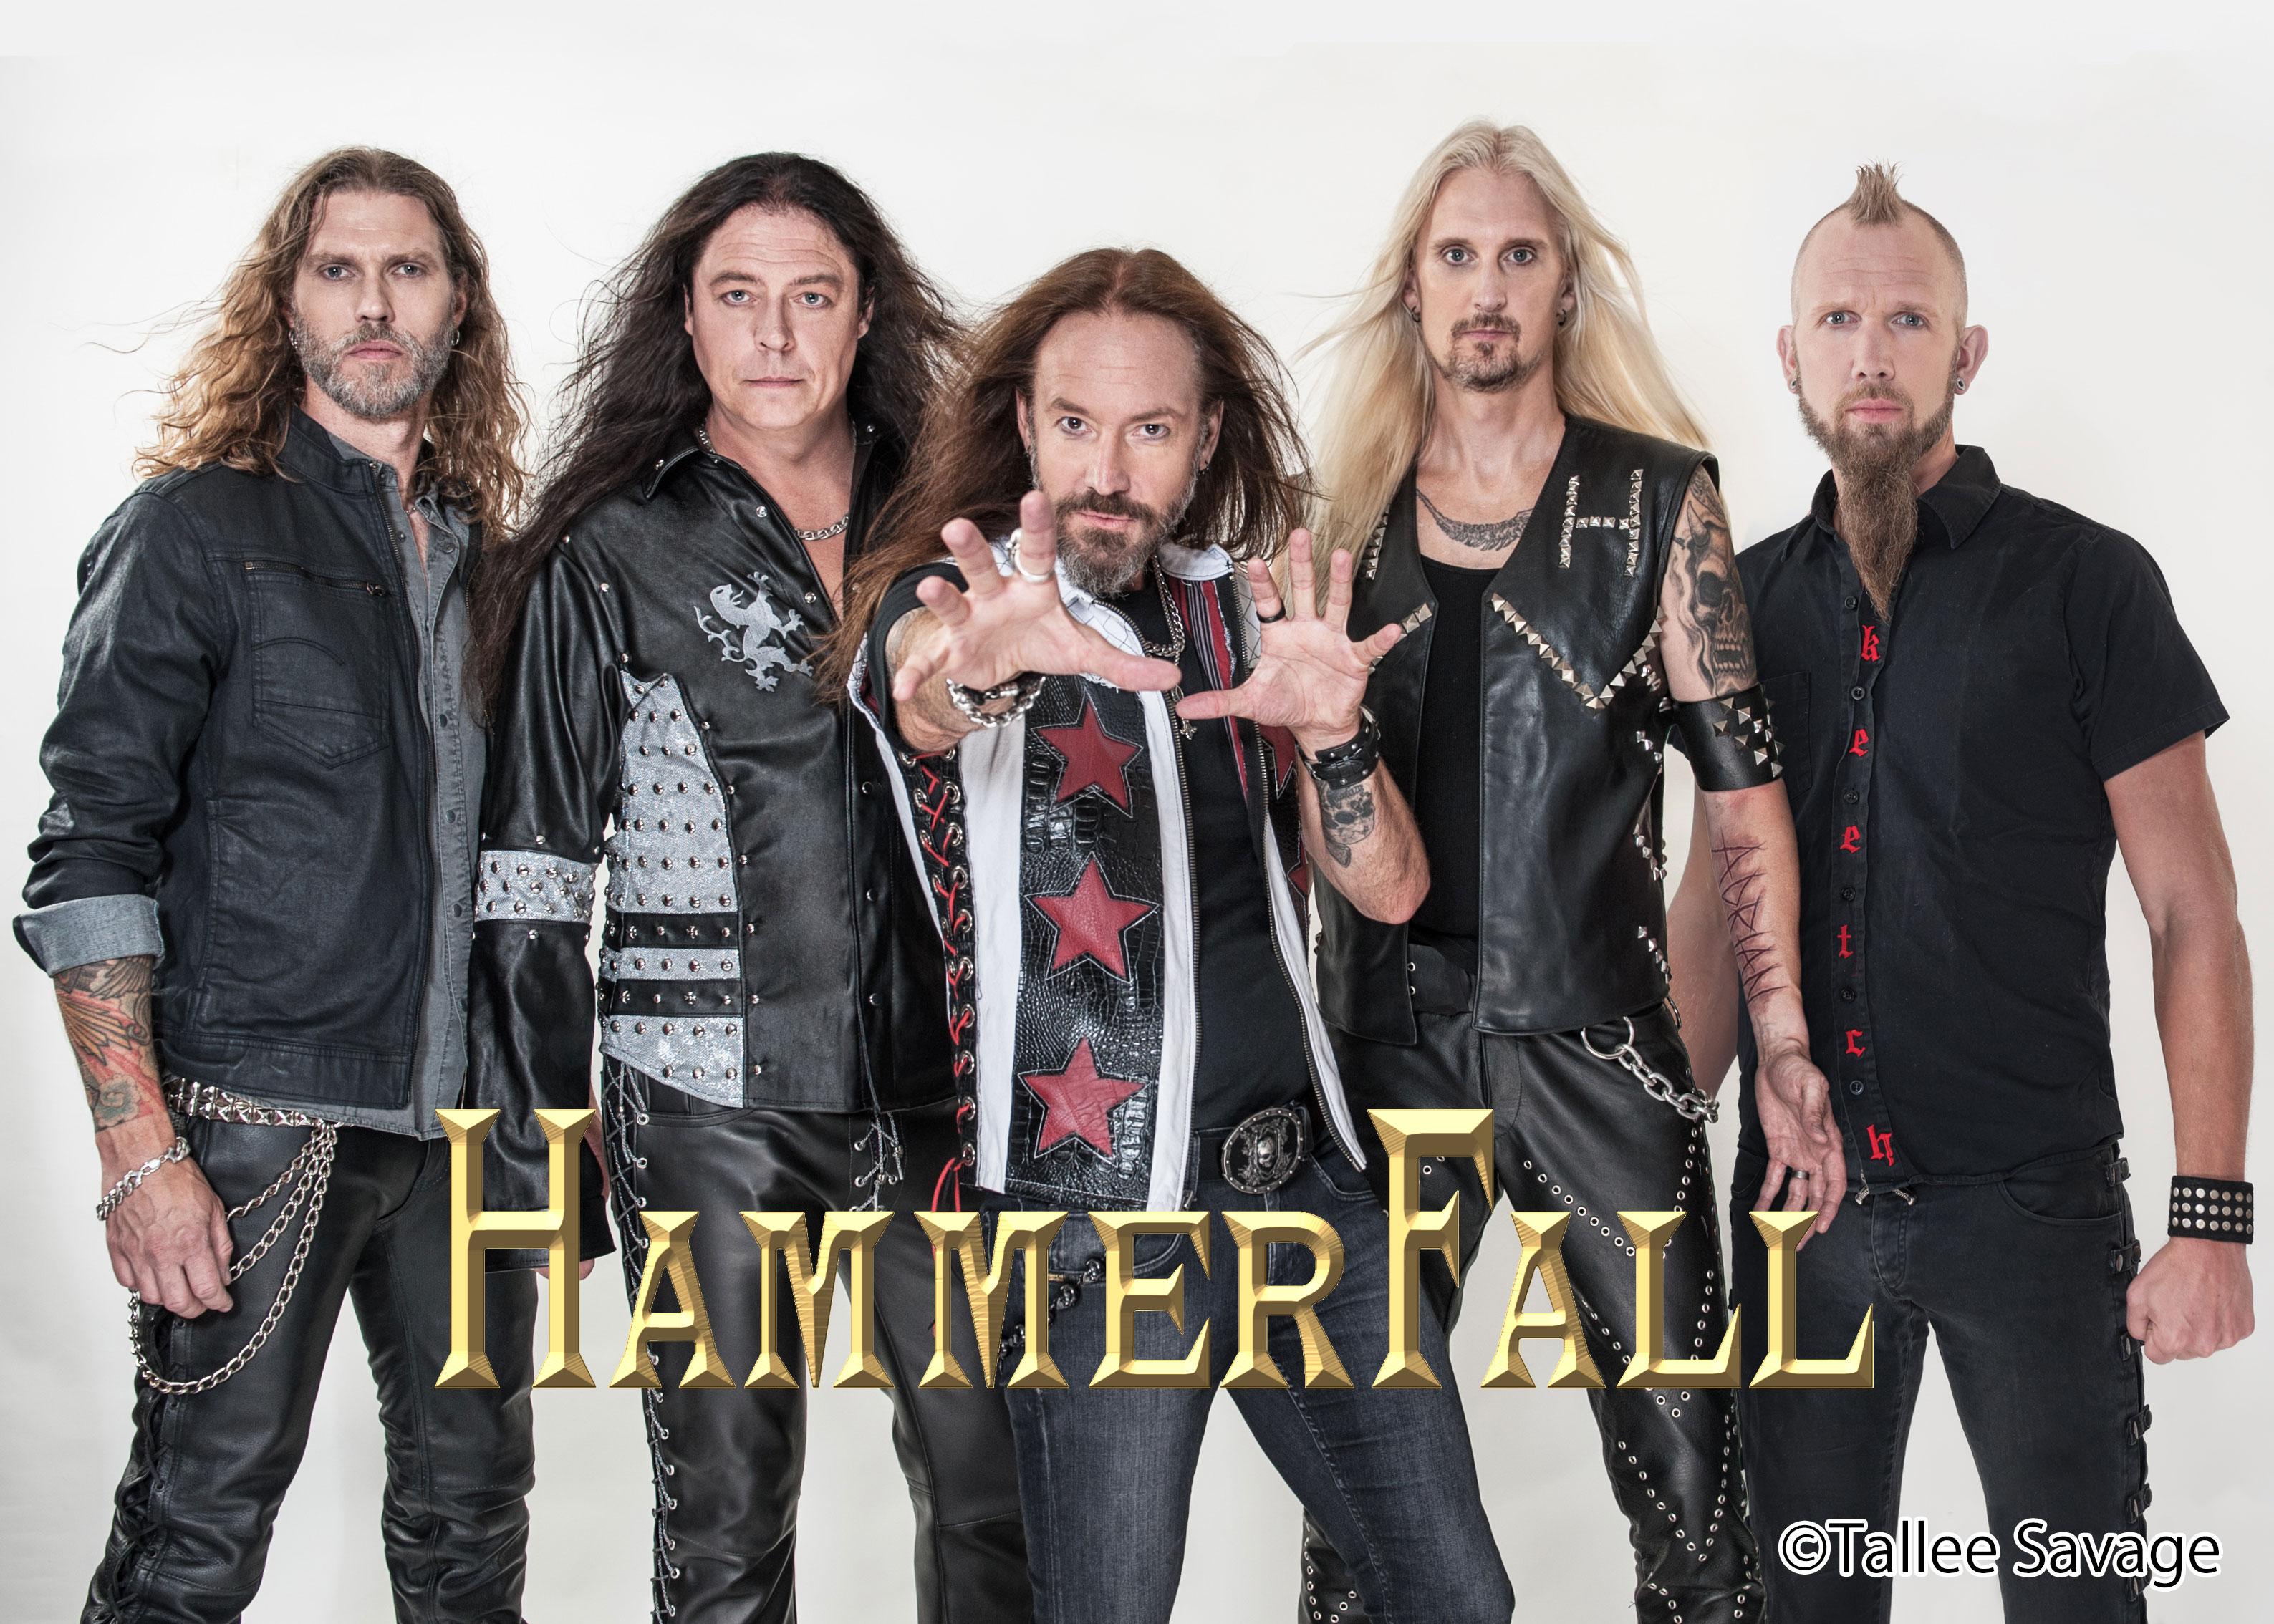 Hammerfallpage